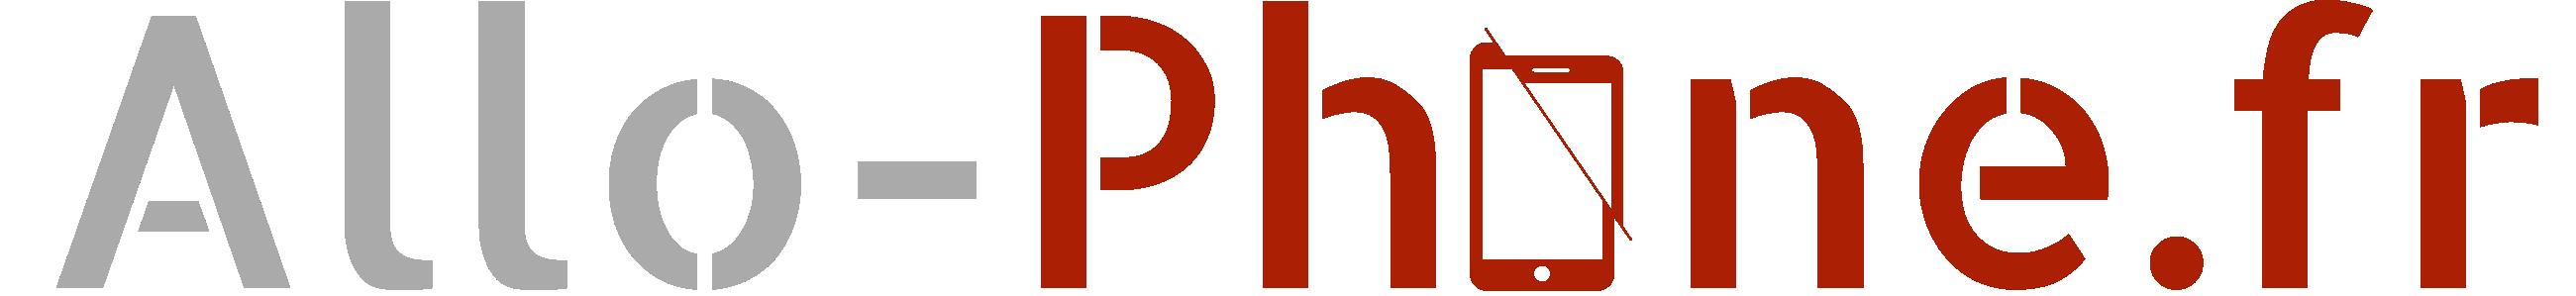 logo du site Allo-phone.fr